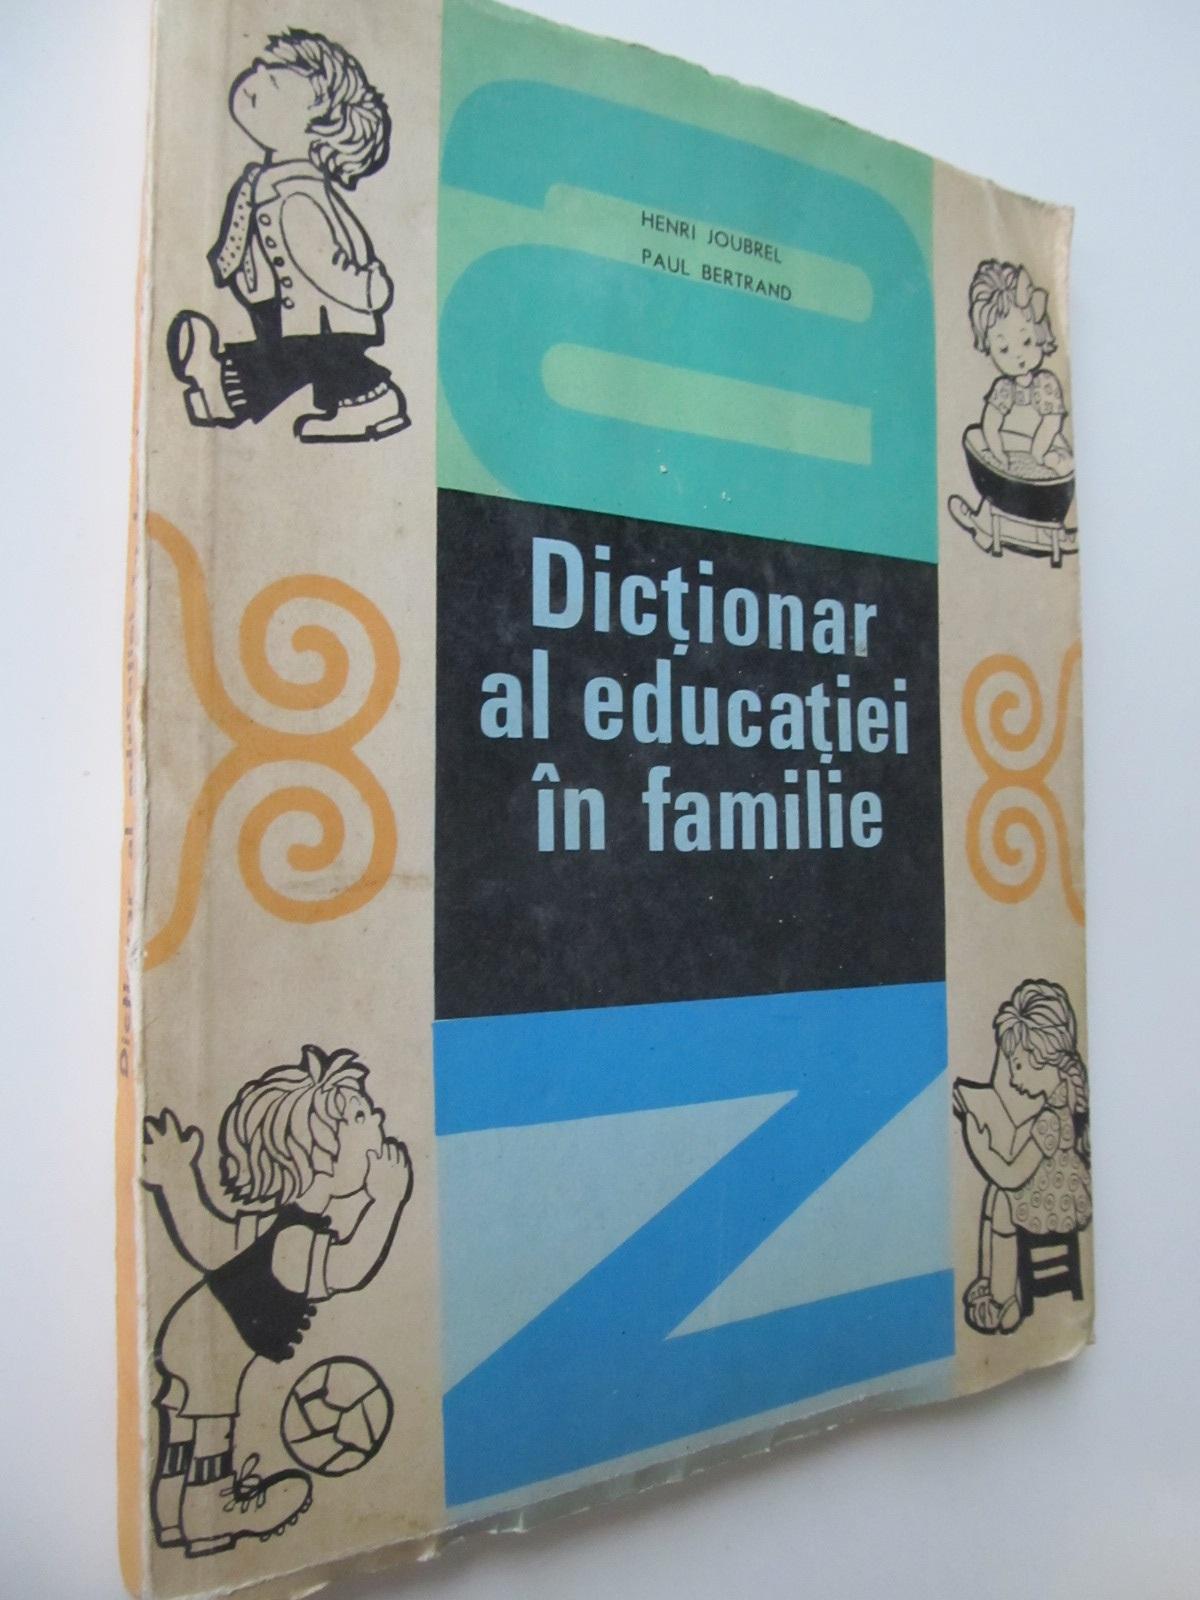 Dictionar al educatiei in familie - Henri Joubrel , Paul Bertrand | Detalii carte